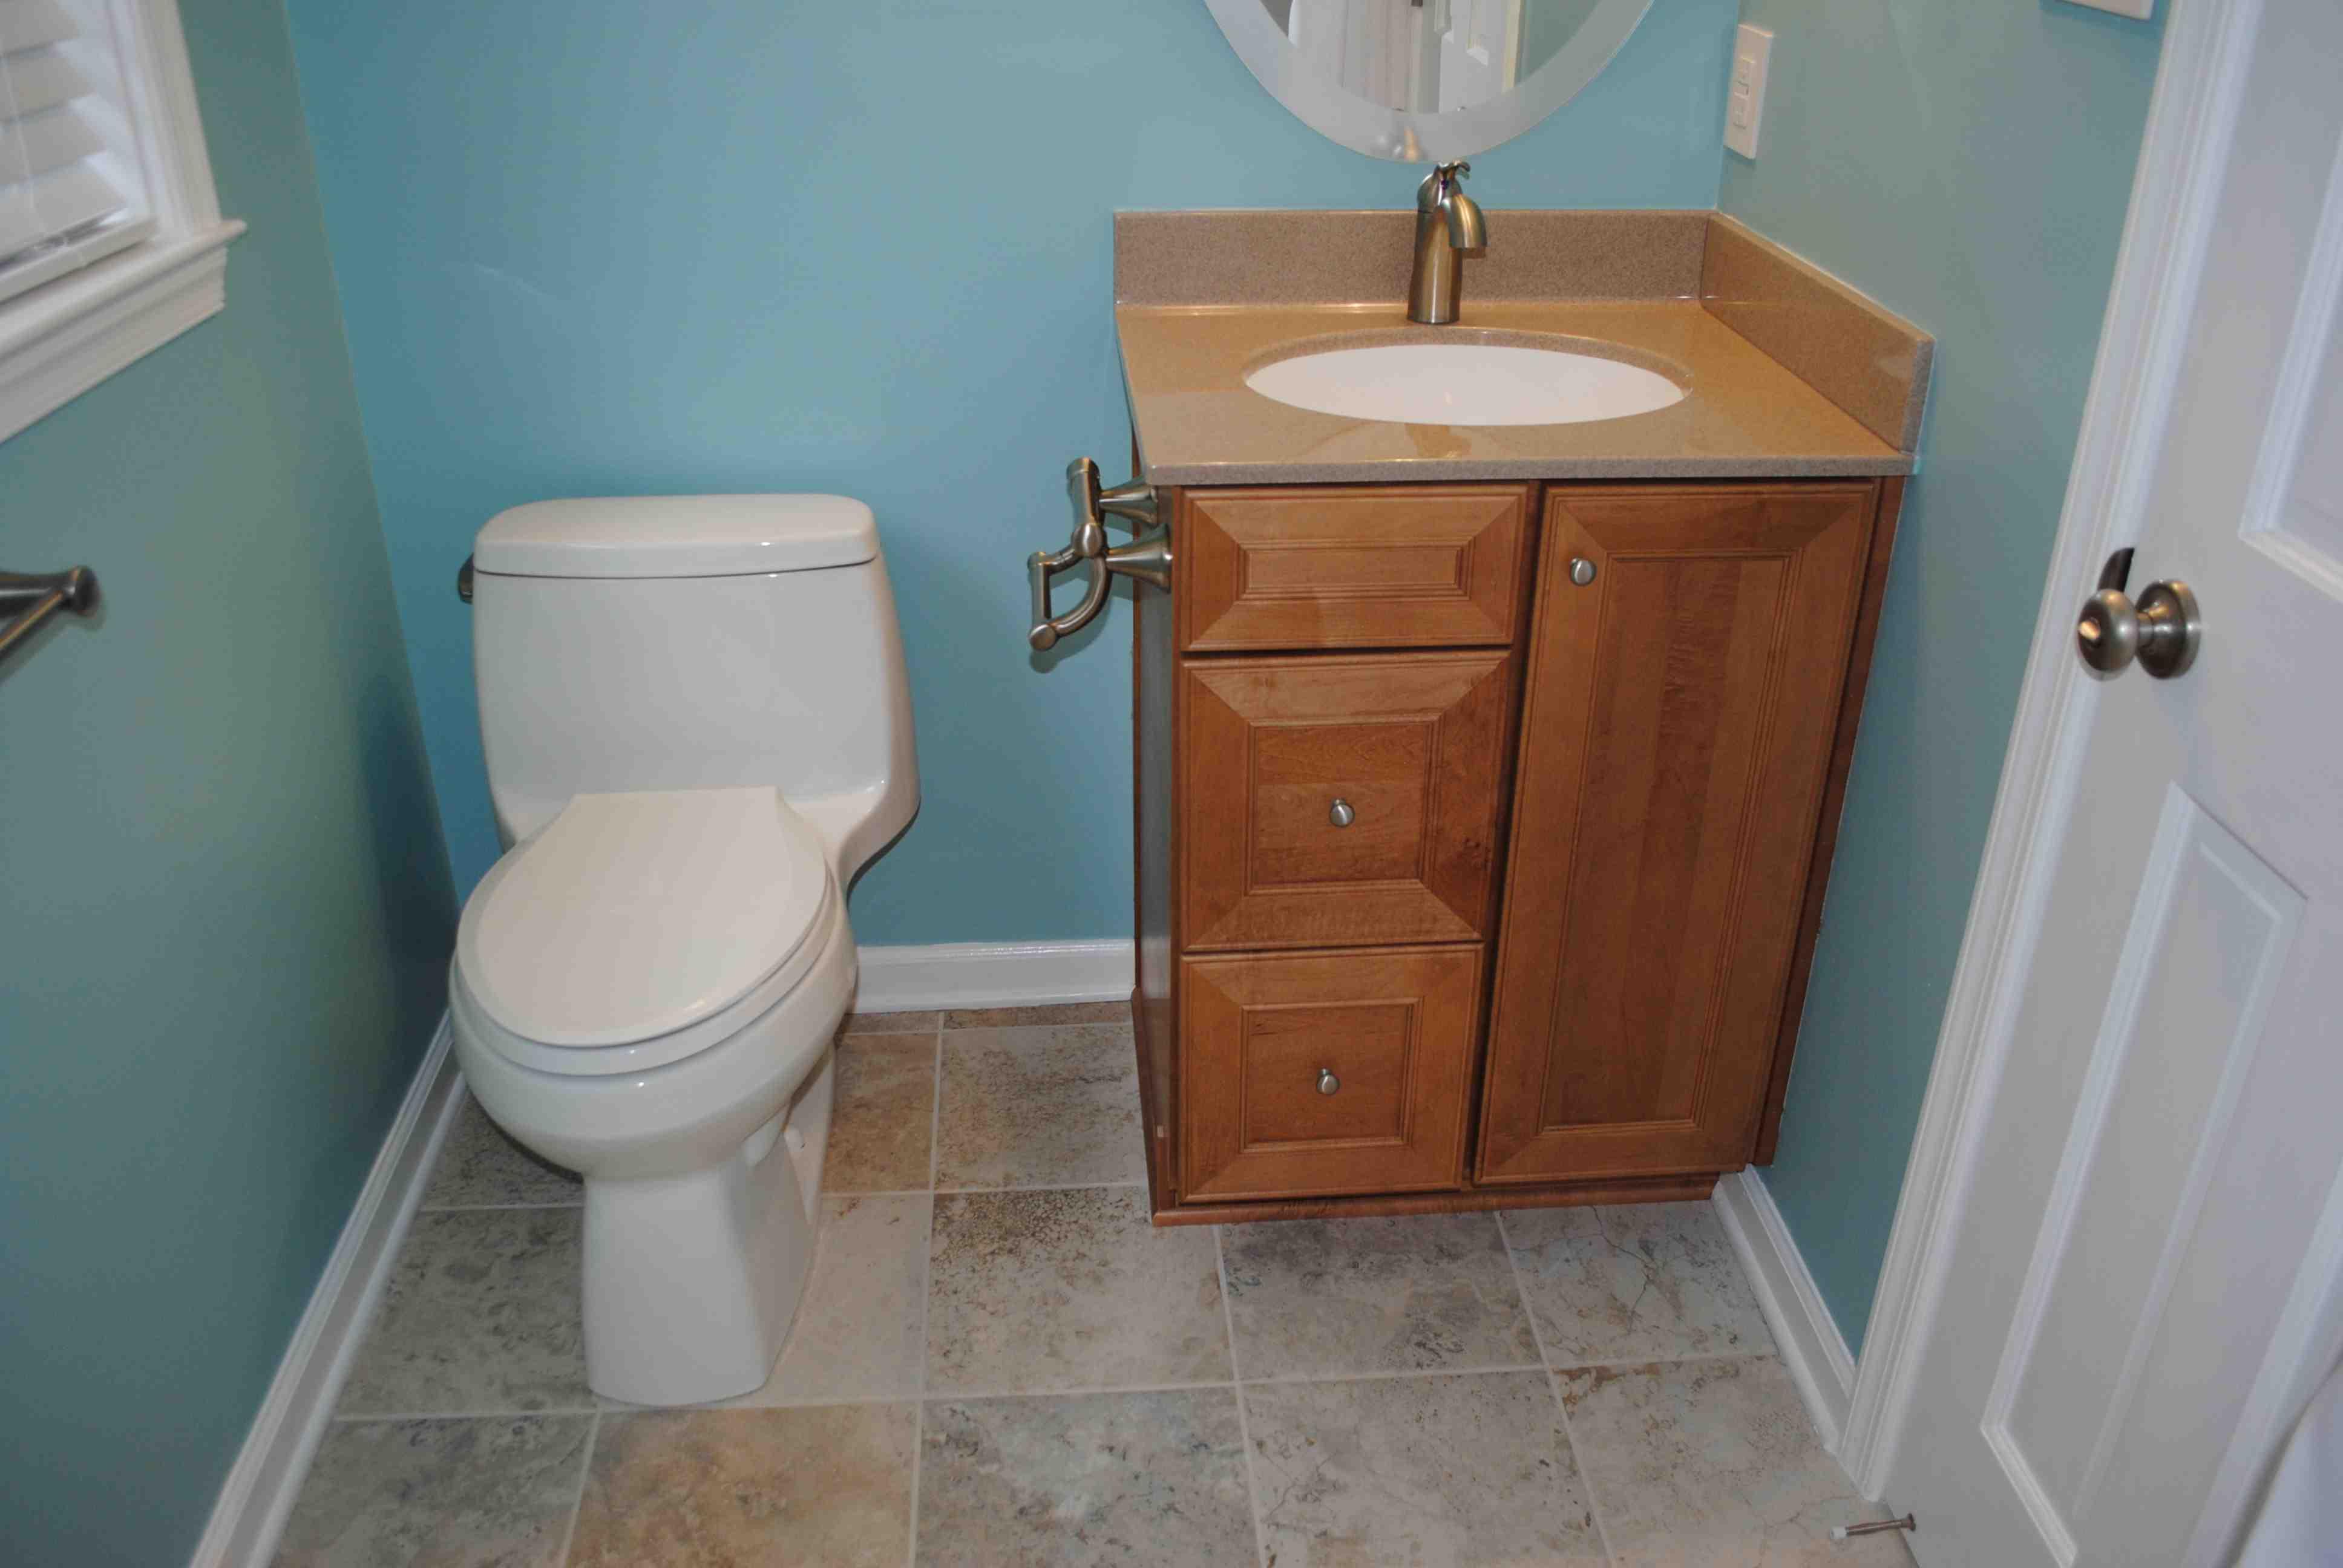 Universal Bathroom Design Best Kitchen Gallery Rachelxblog - Hatchett bathroom remodel